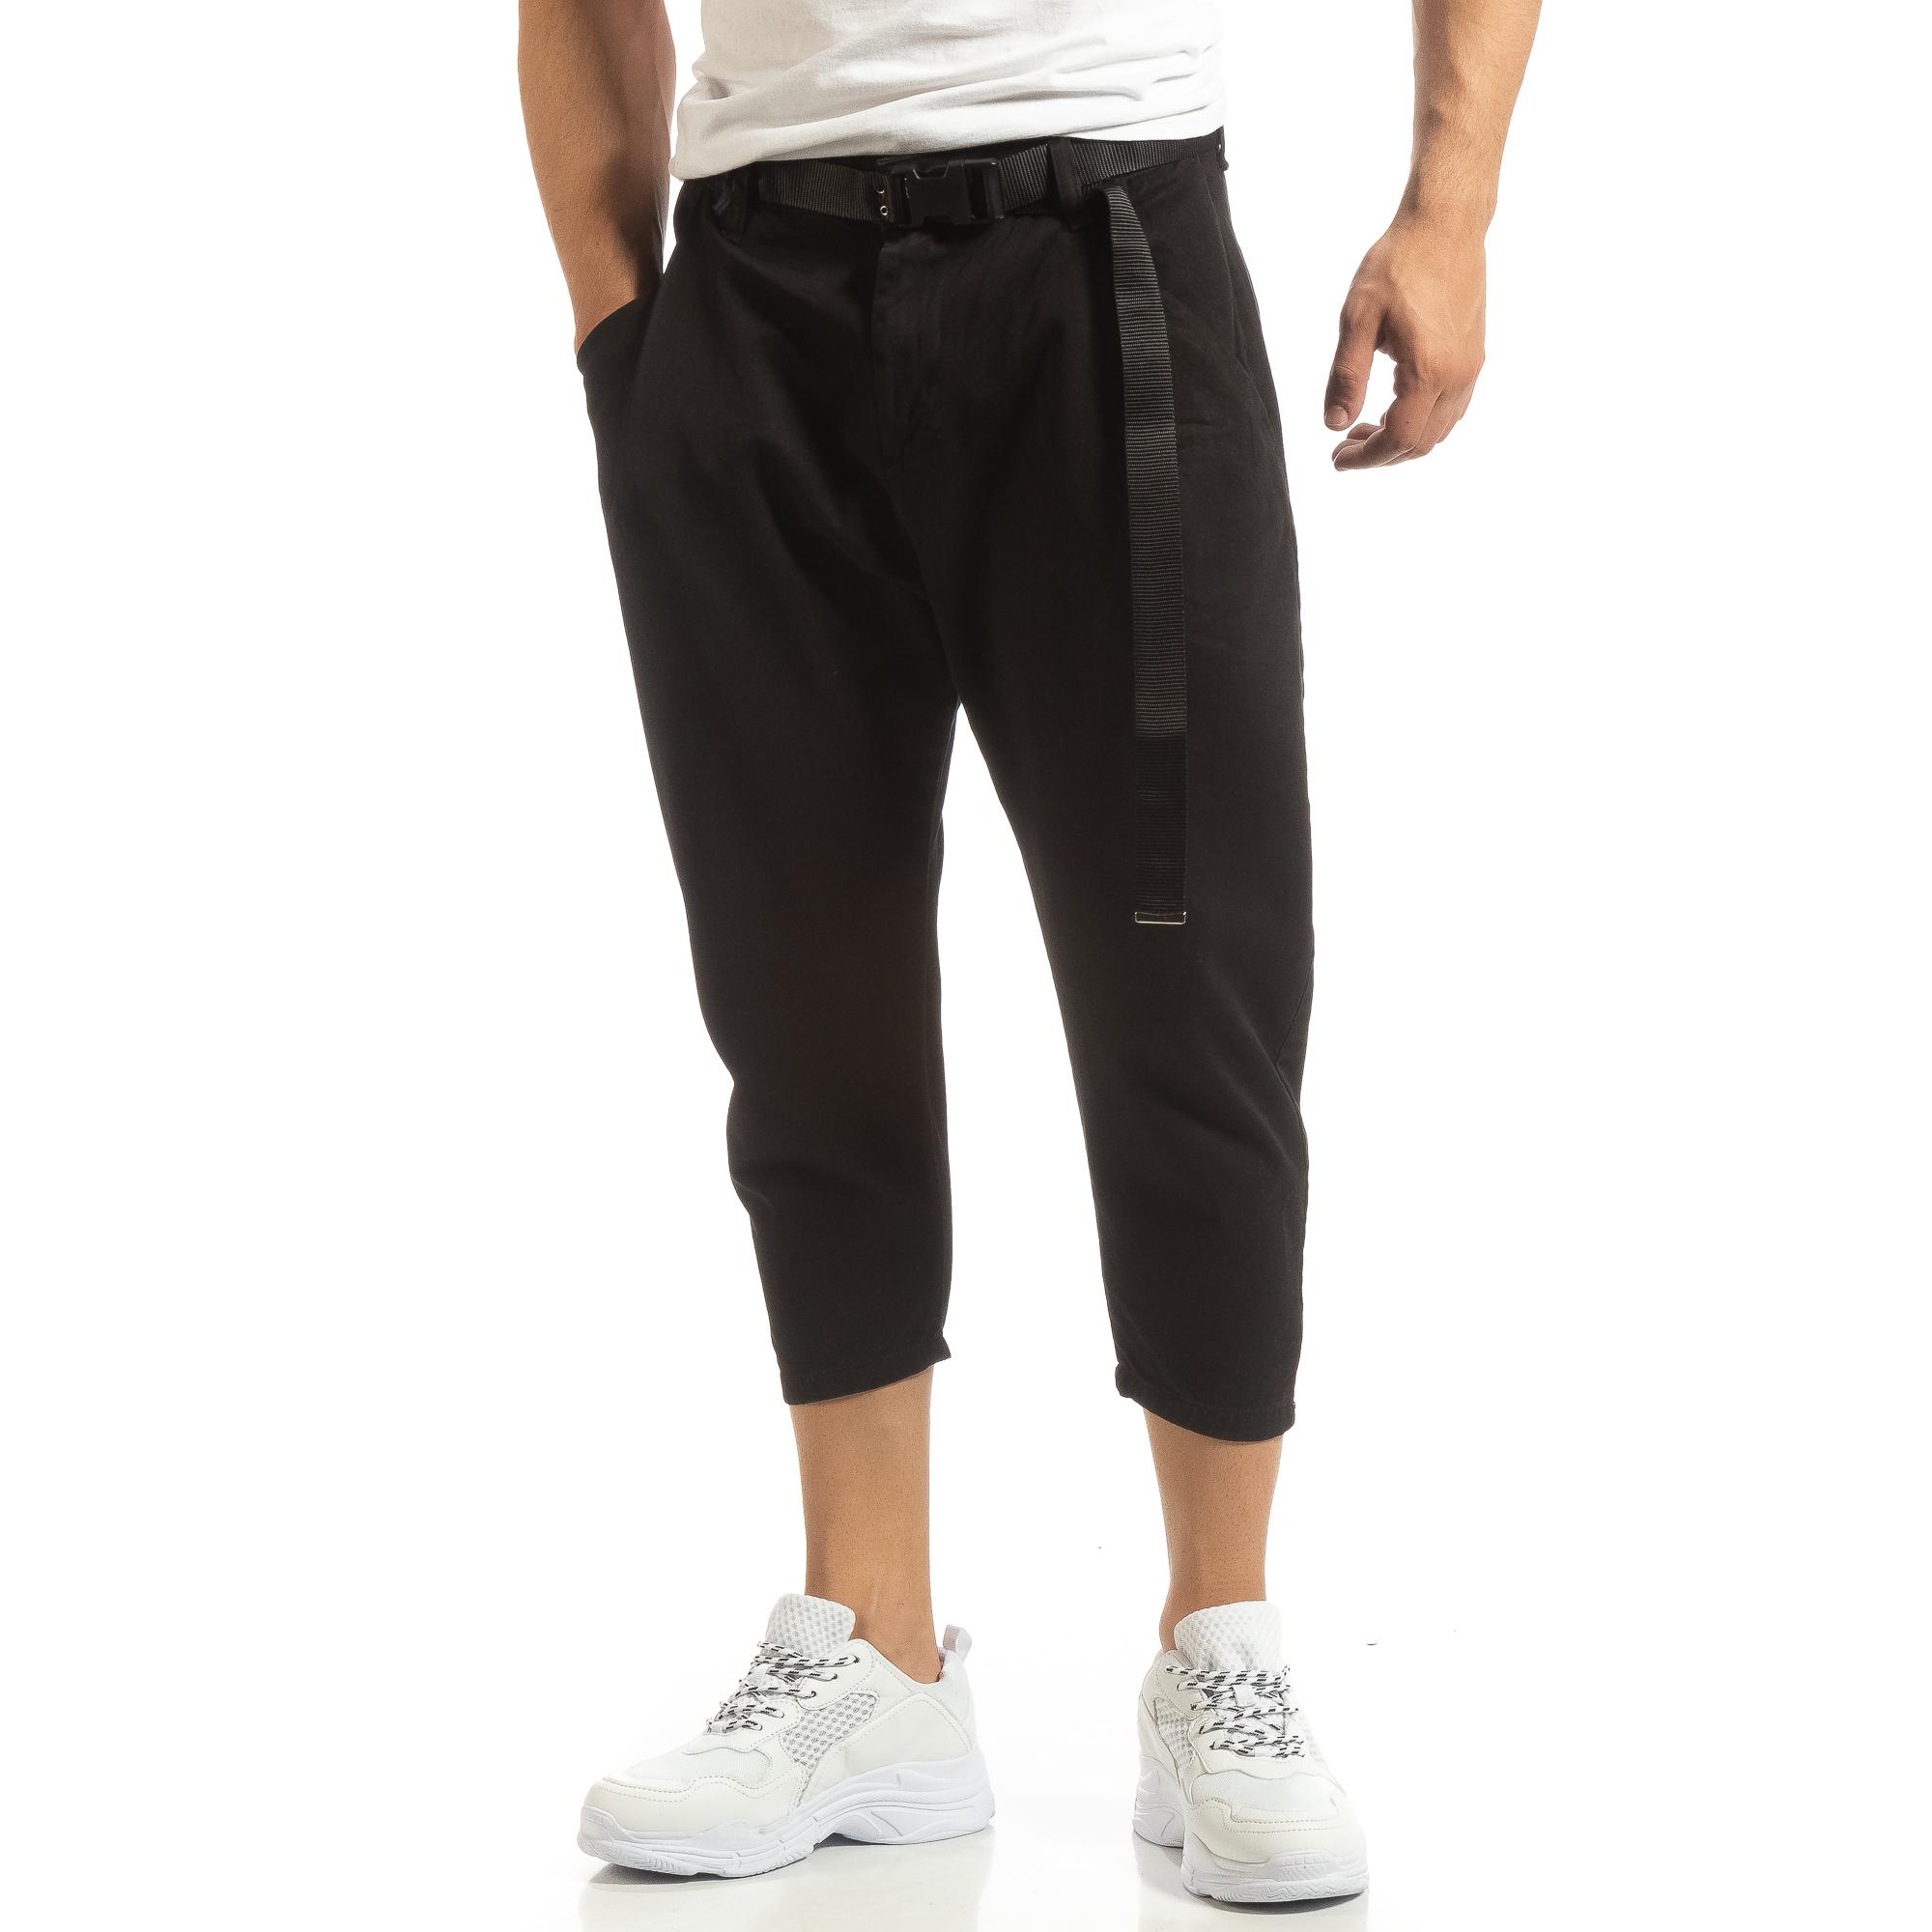 Cropped ανδρικό μαύρο παντελόνι